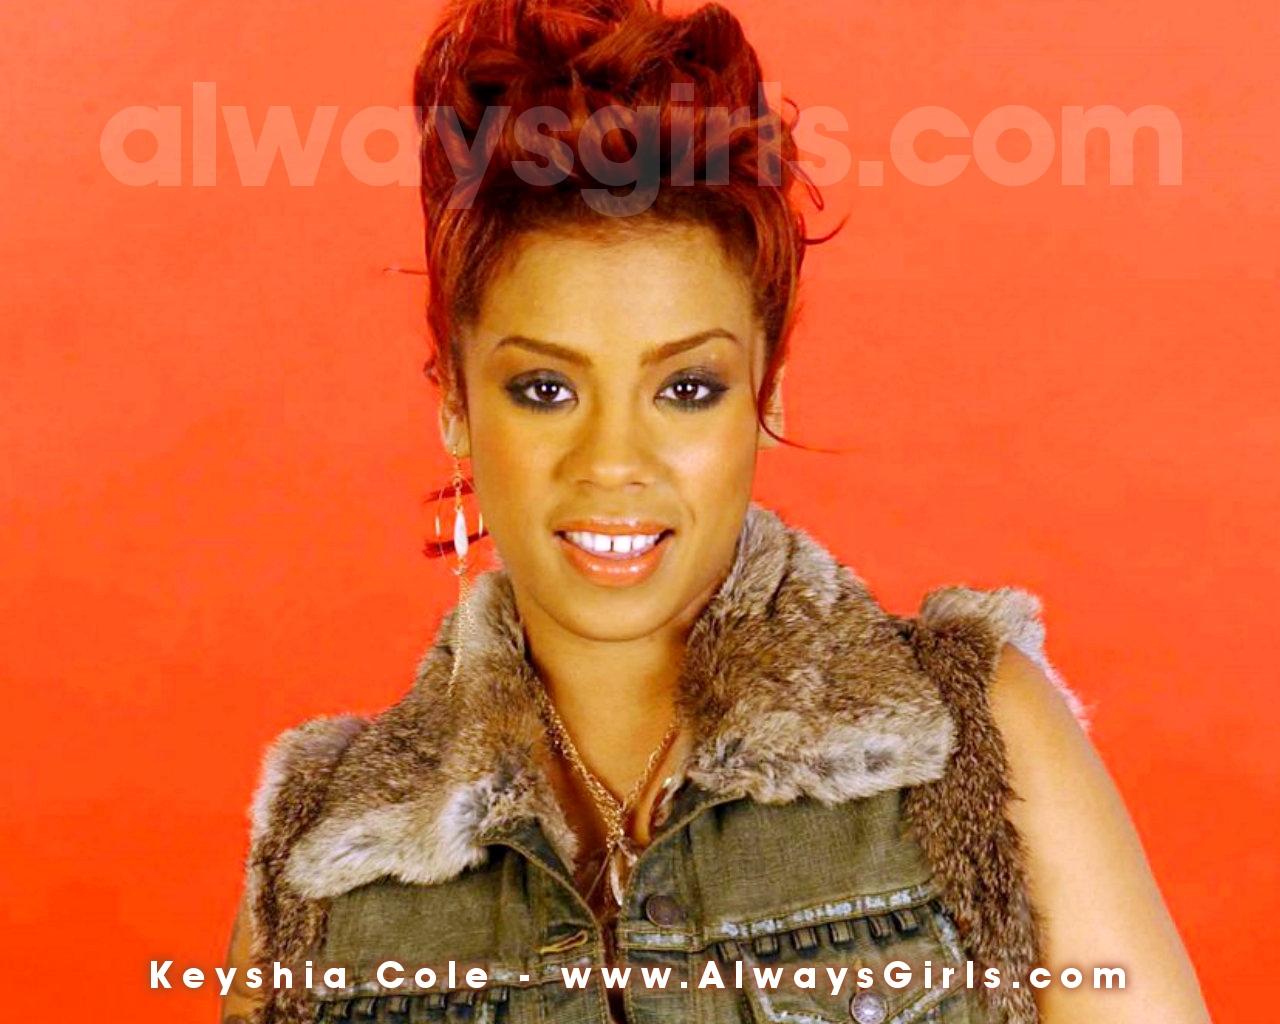 Keyshia Cole Hairstyle Trends Keyshia Cole Hairstyle